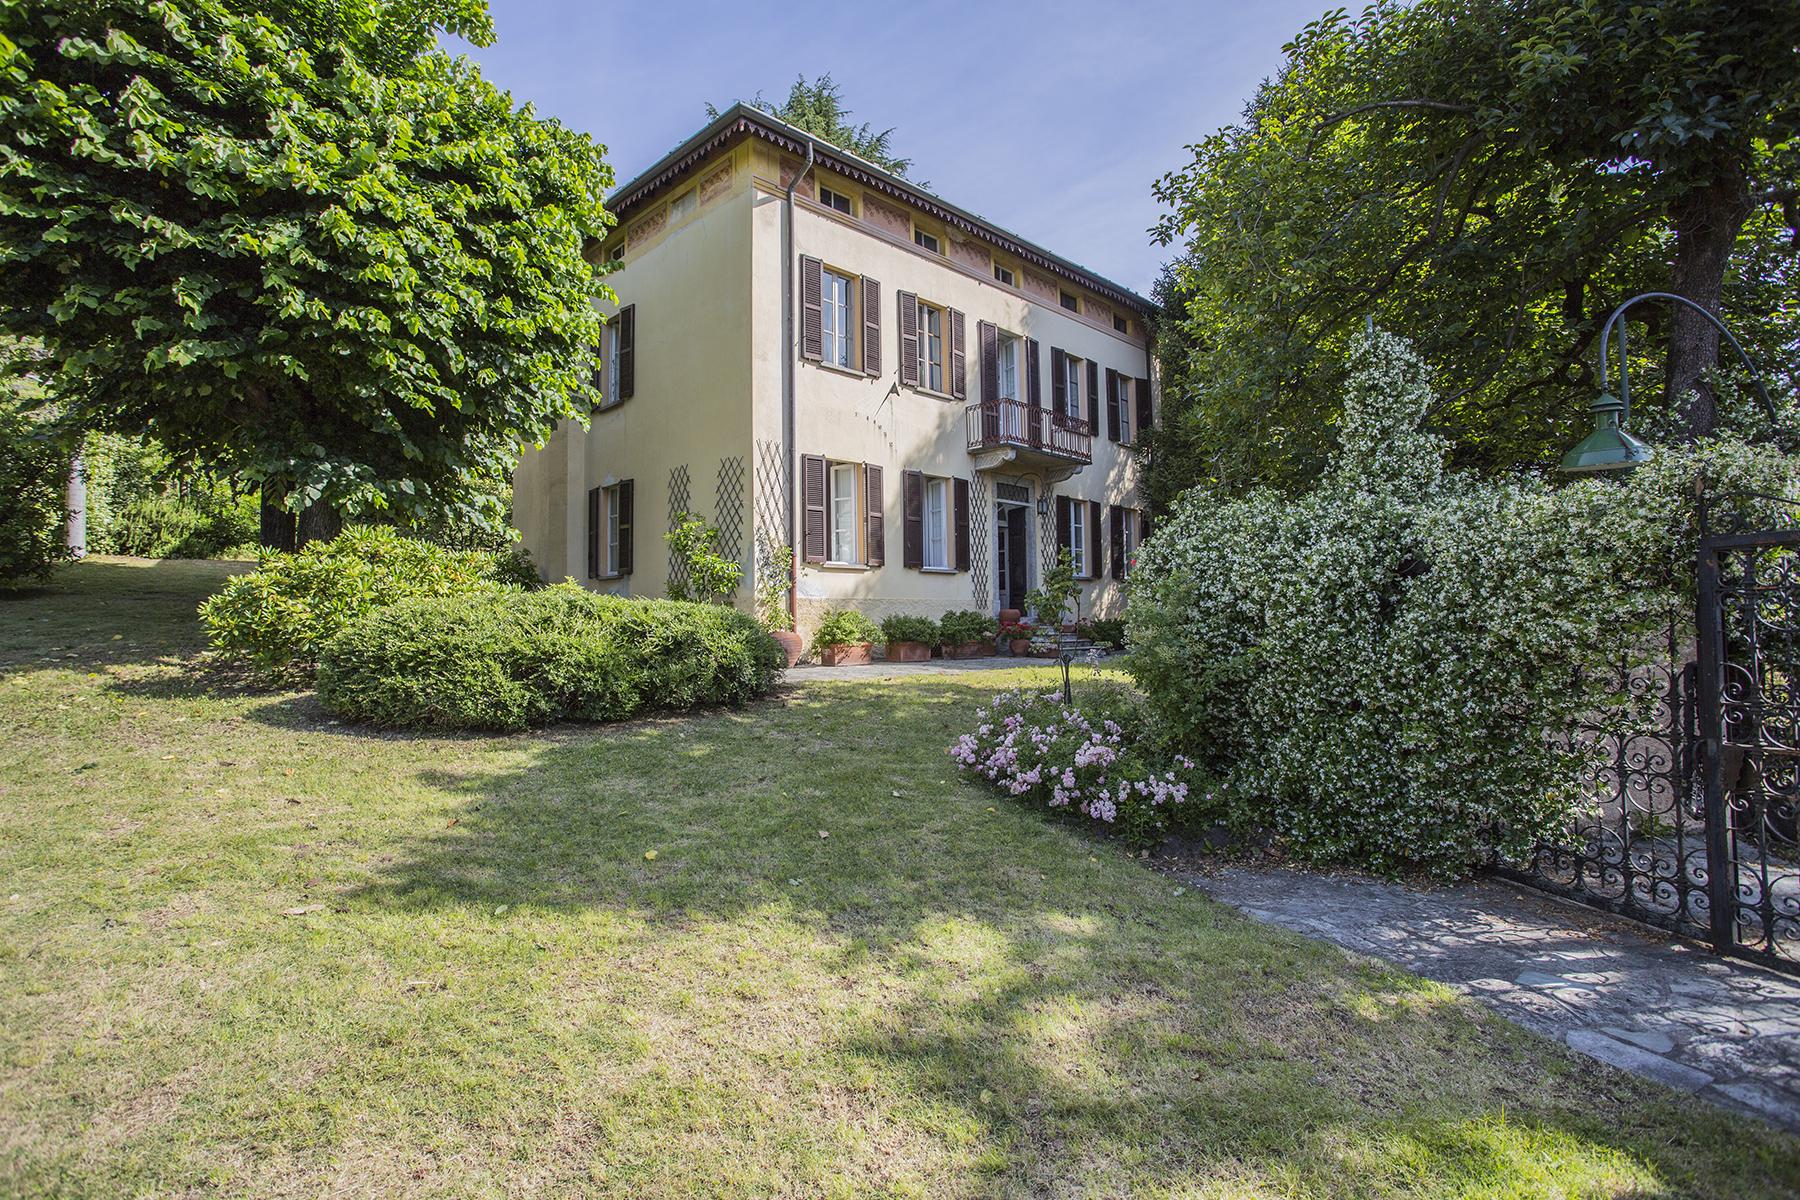 Single Family Home for Sale at Elegant period villa with large park Via Per Vercana Other Como, Como, 22013 Italy